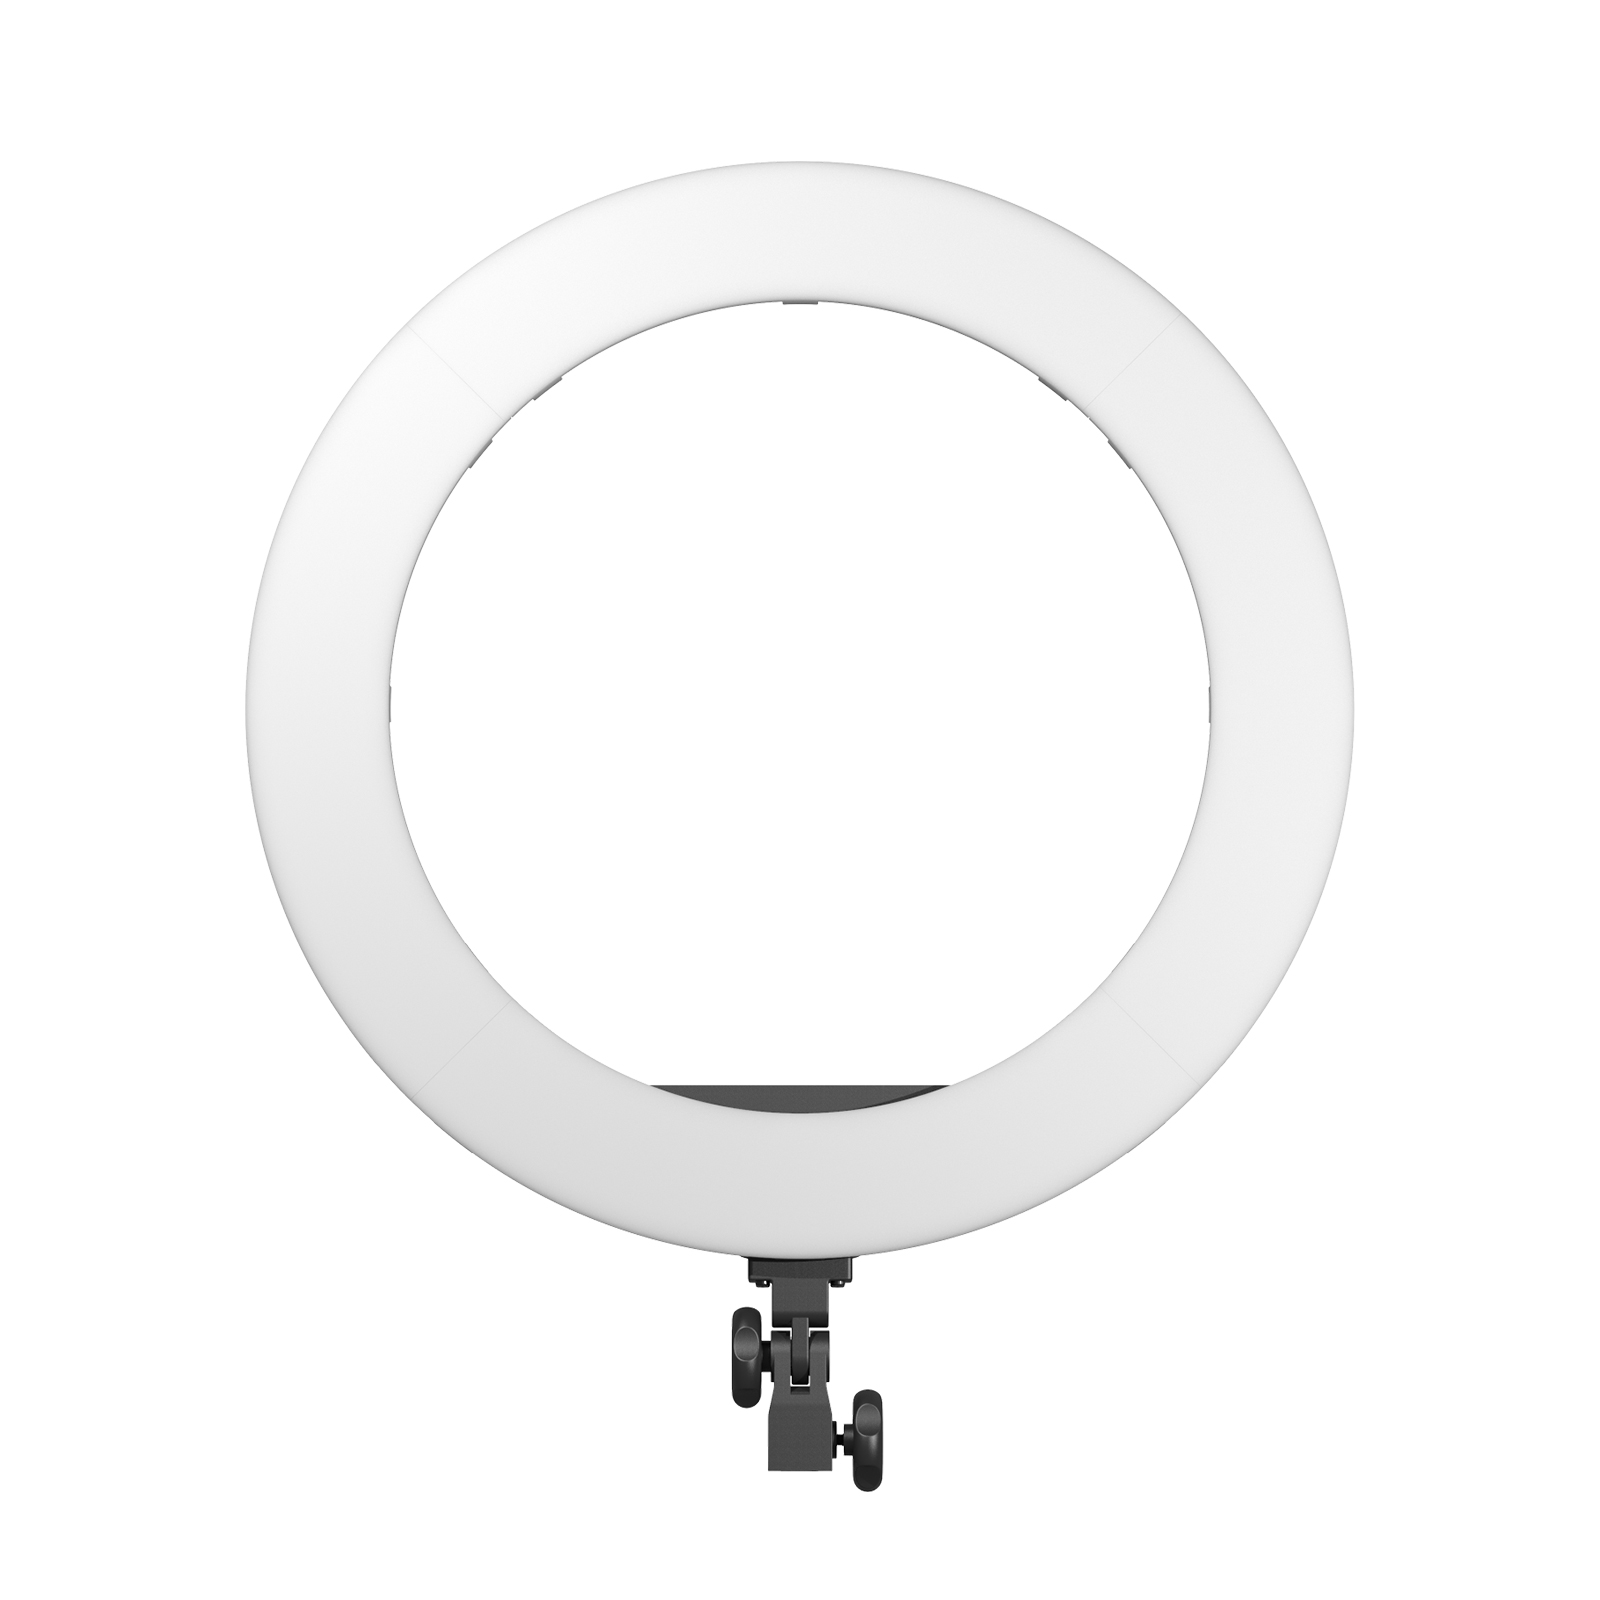 Pixel R60C Ring Light, 60W brightness upgrade, various power supply ways, wide light range, wireless control